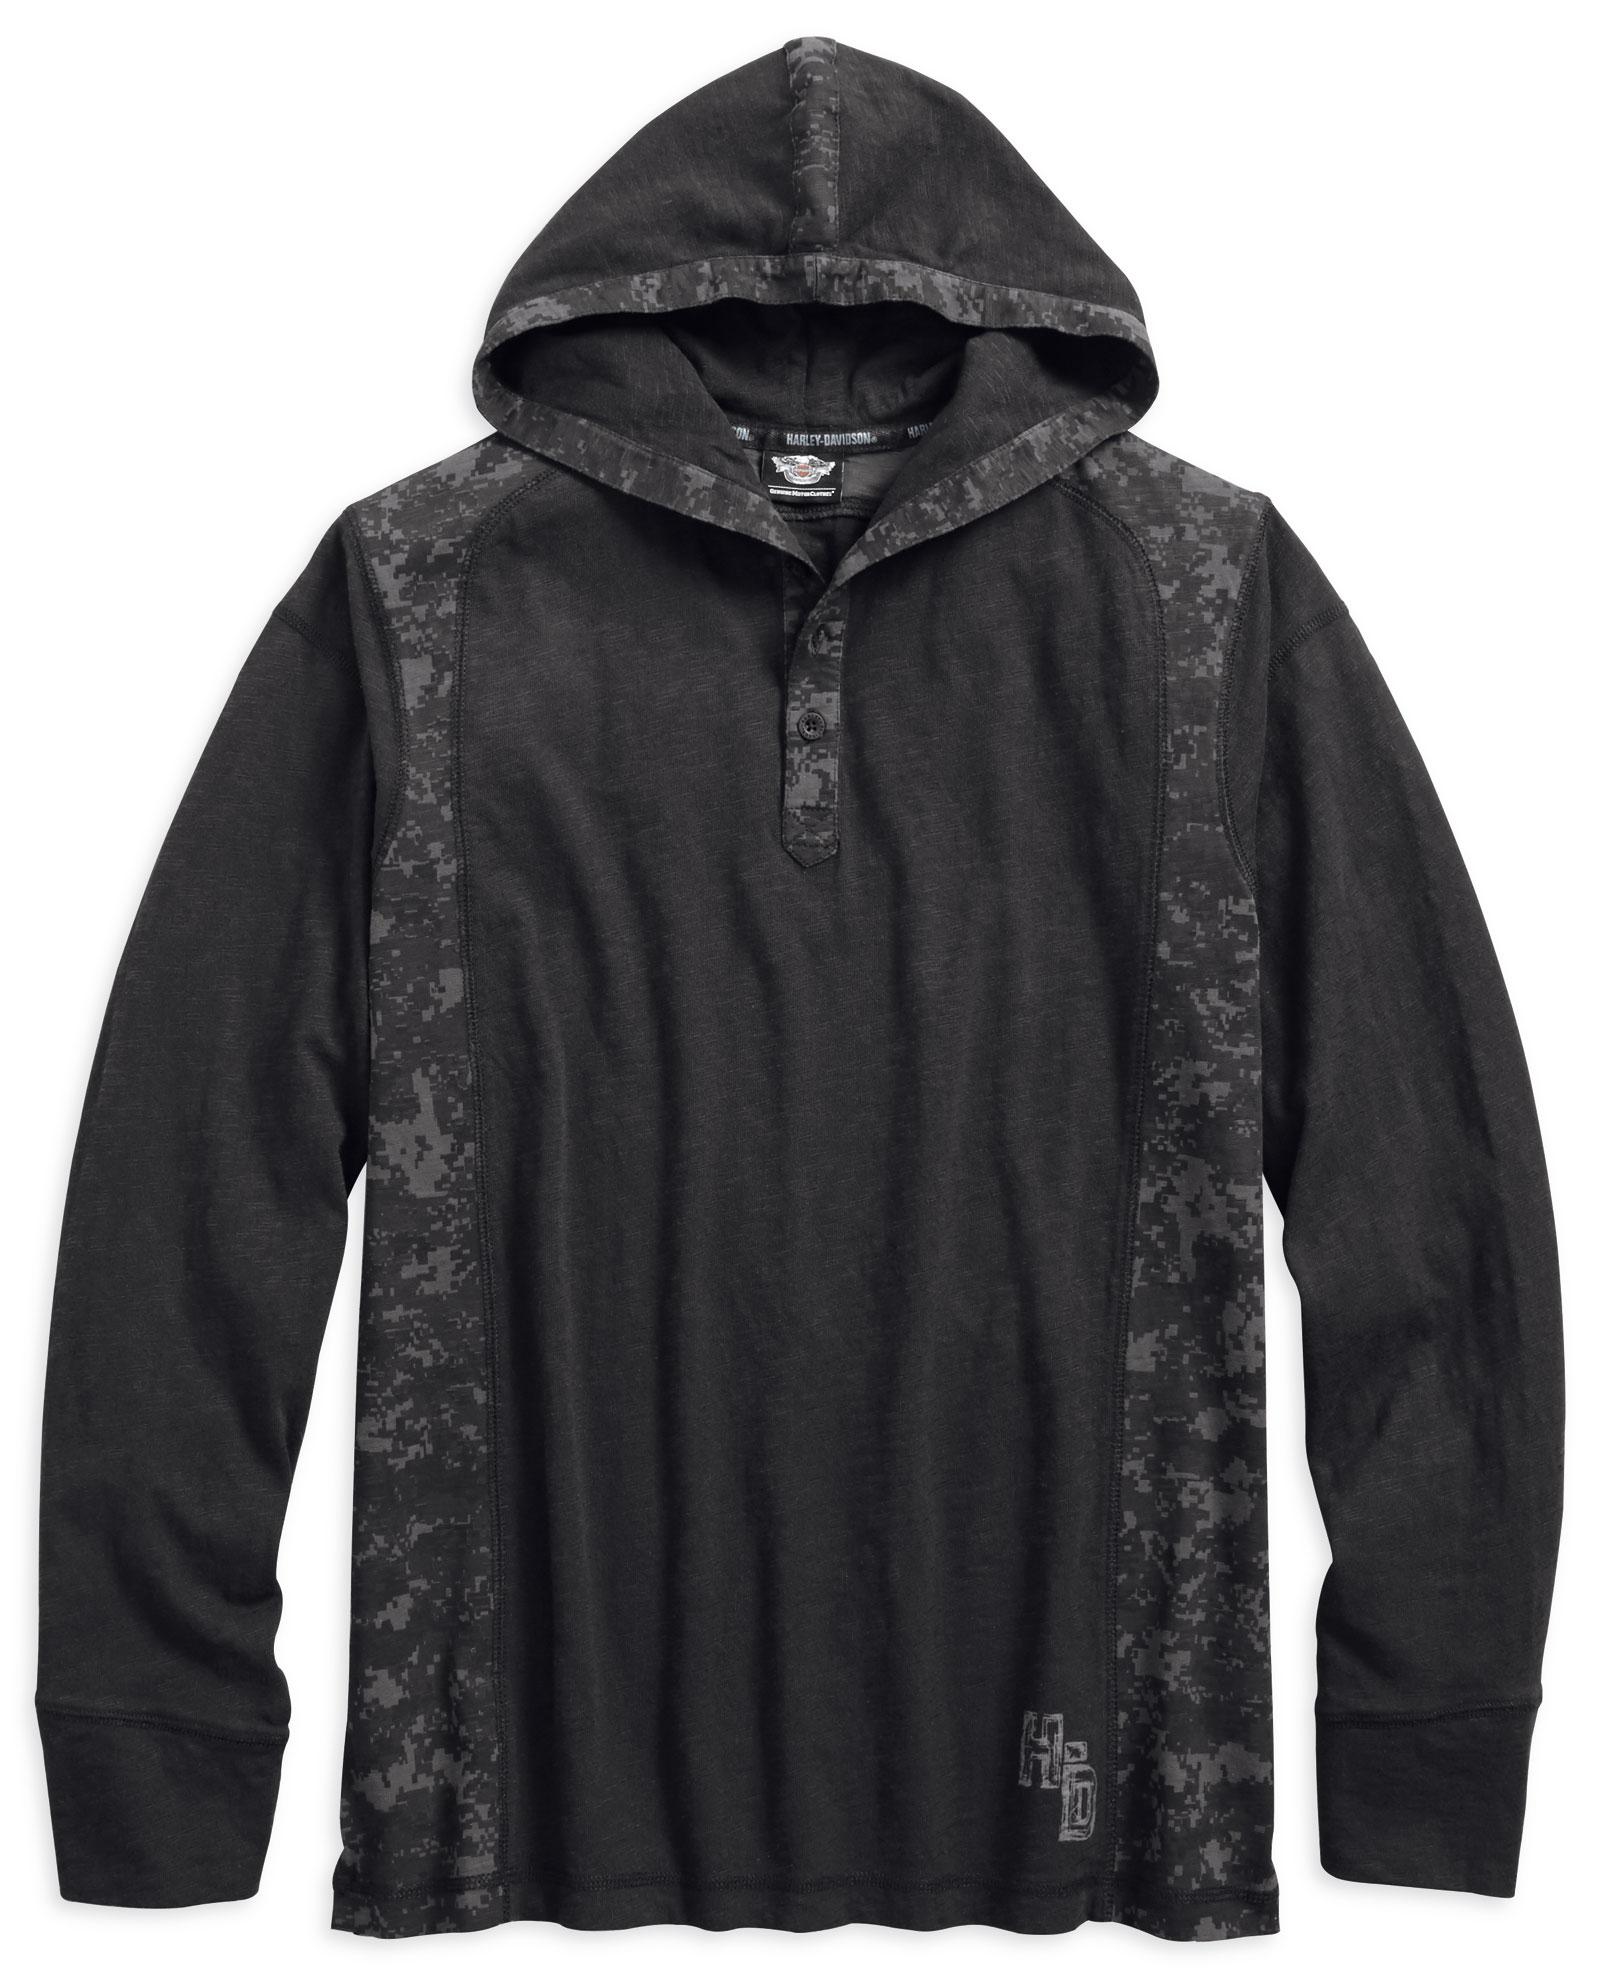 Digital camo hoodies